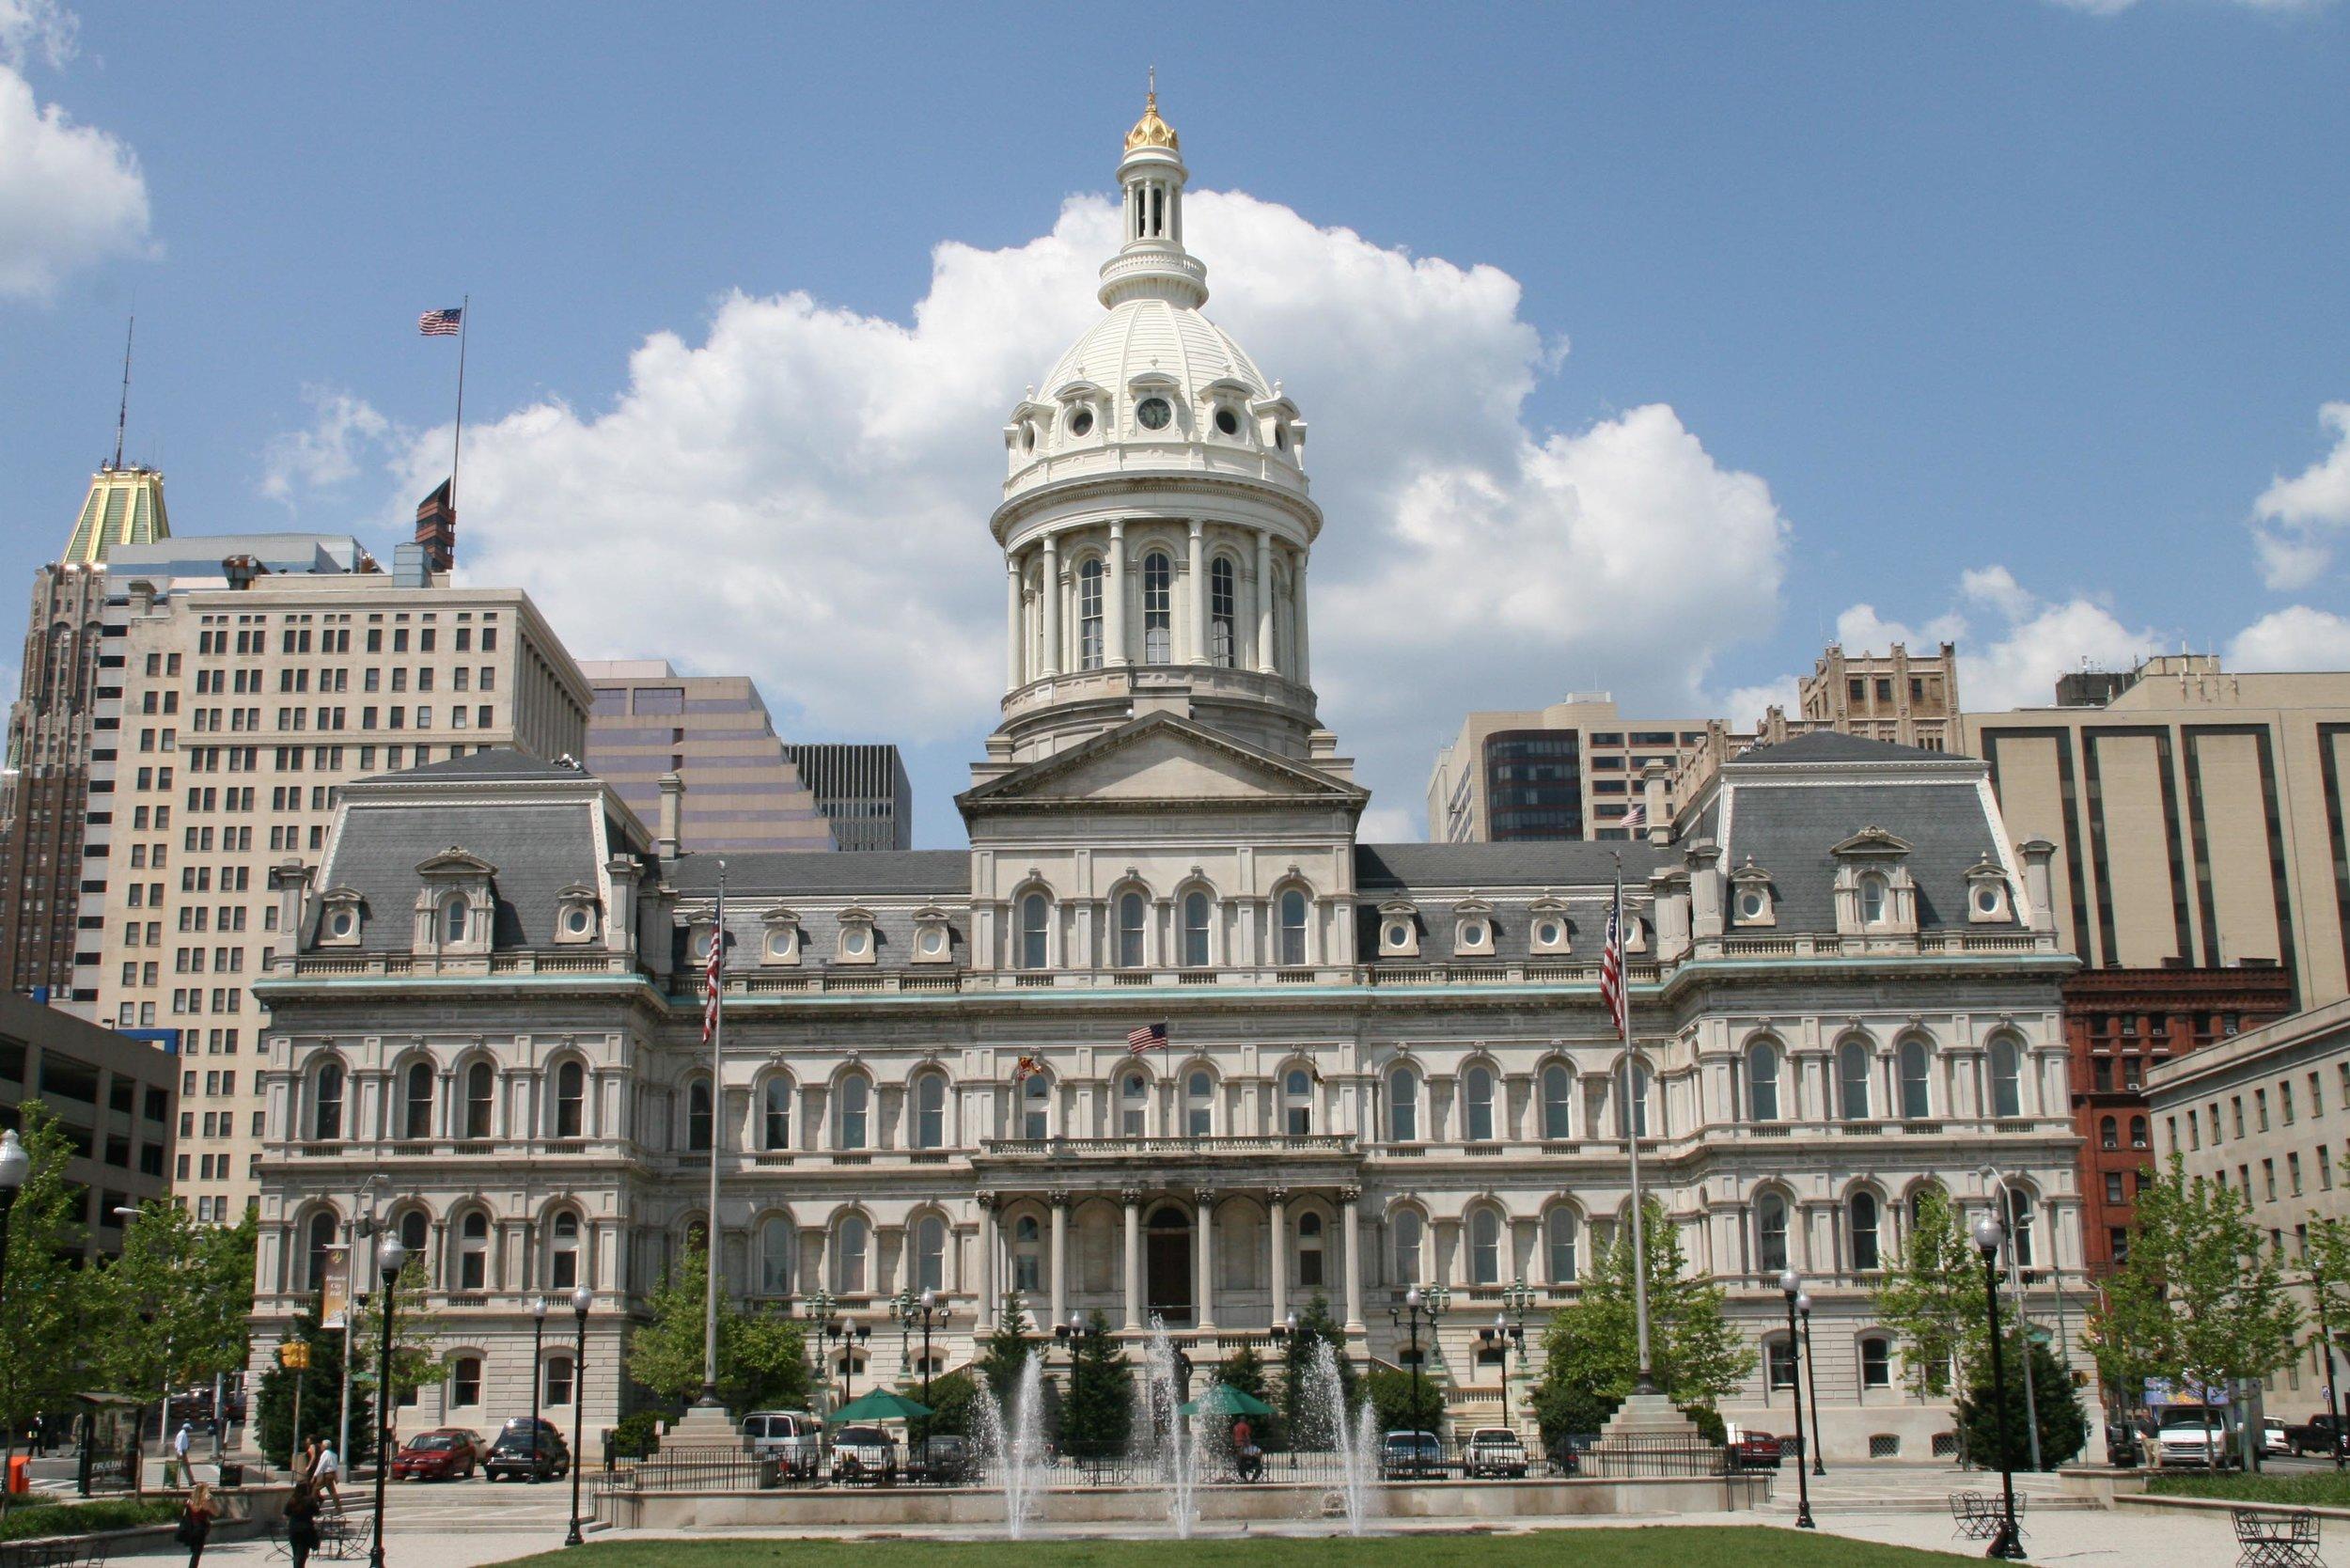 City Hall - Baltimore, Maryland